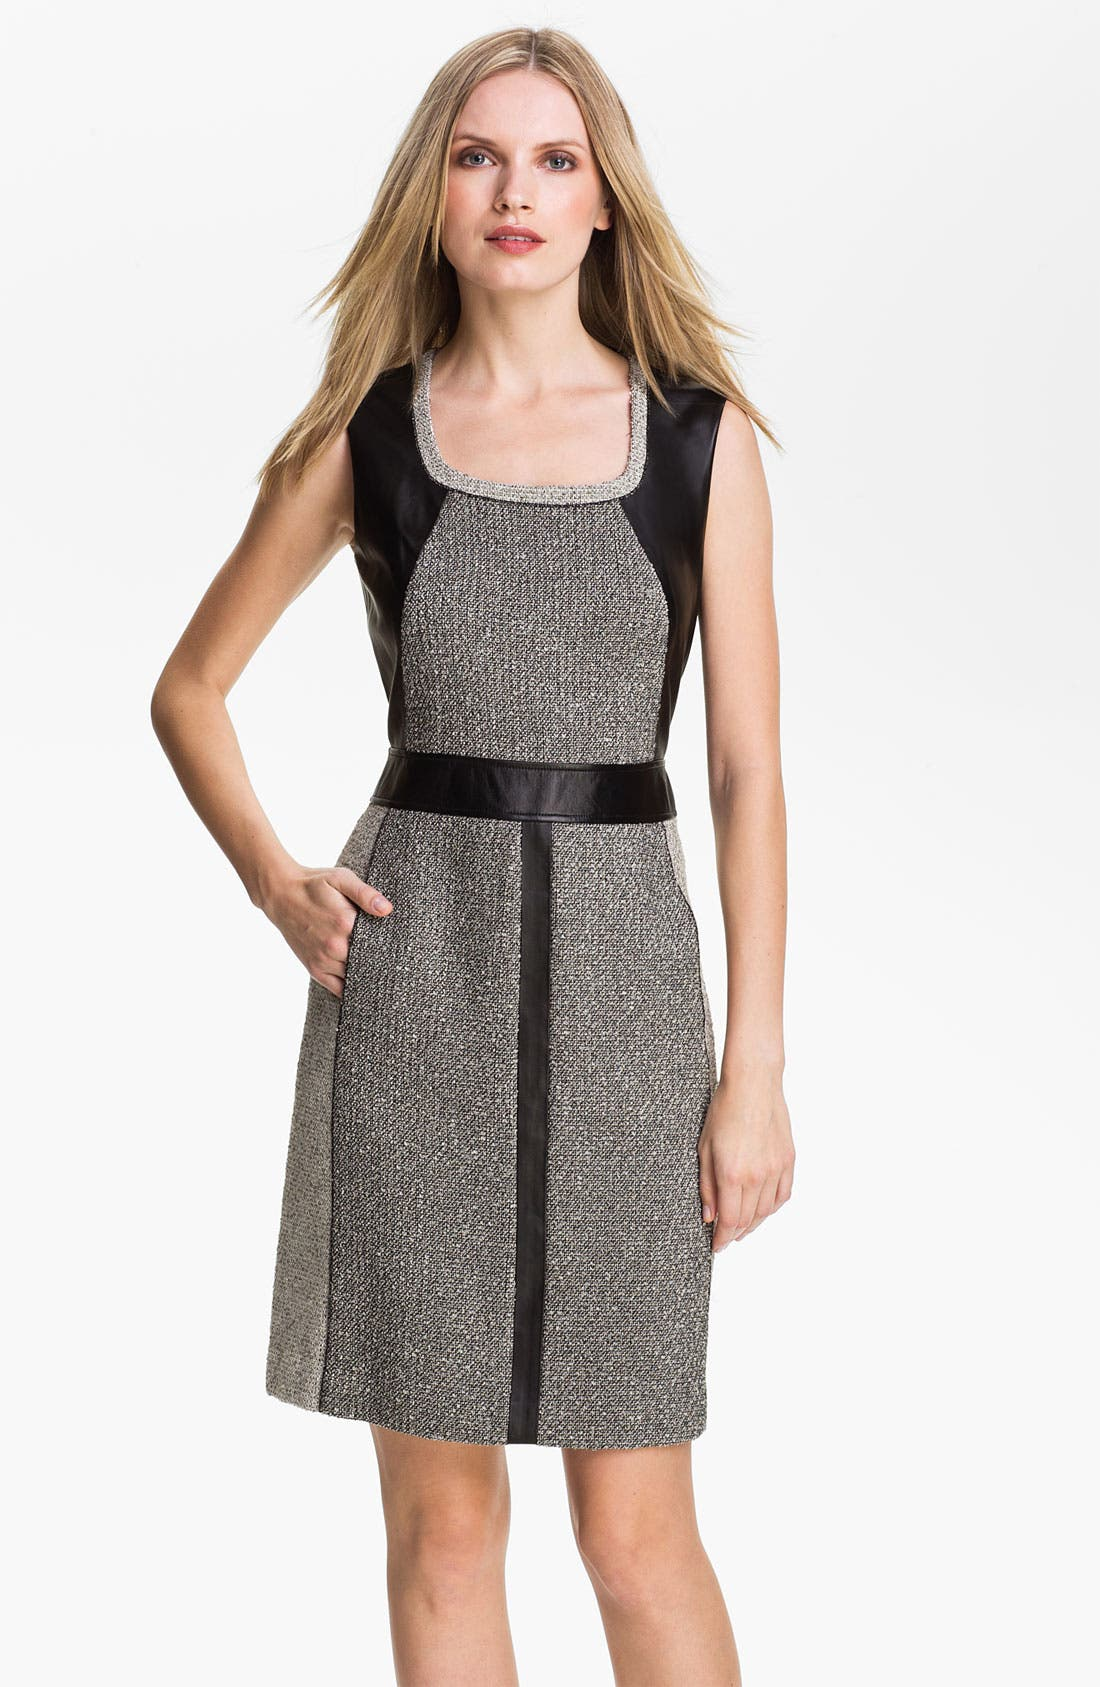 Alternate Image 1 Selected - Lafayette 148 New York 'Seema' Mix Media Dress